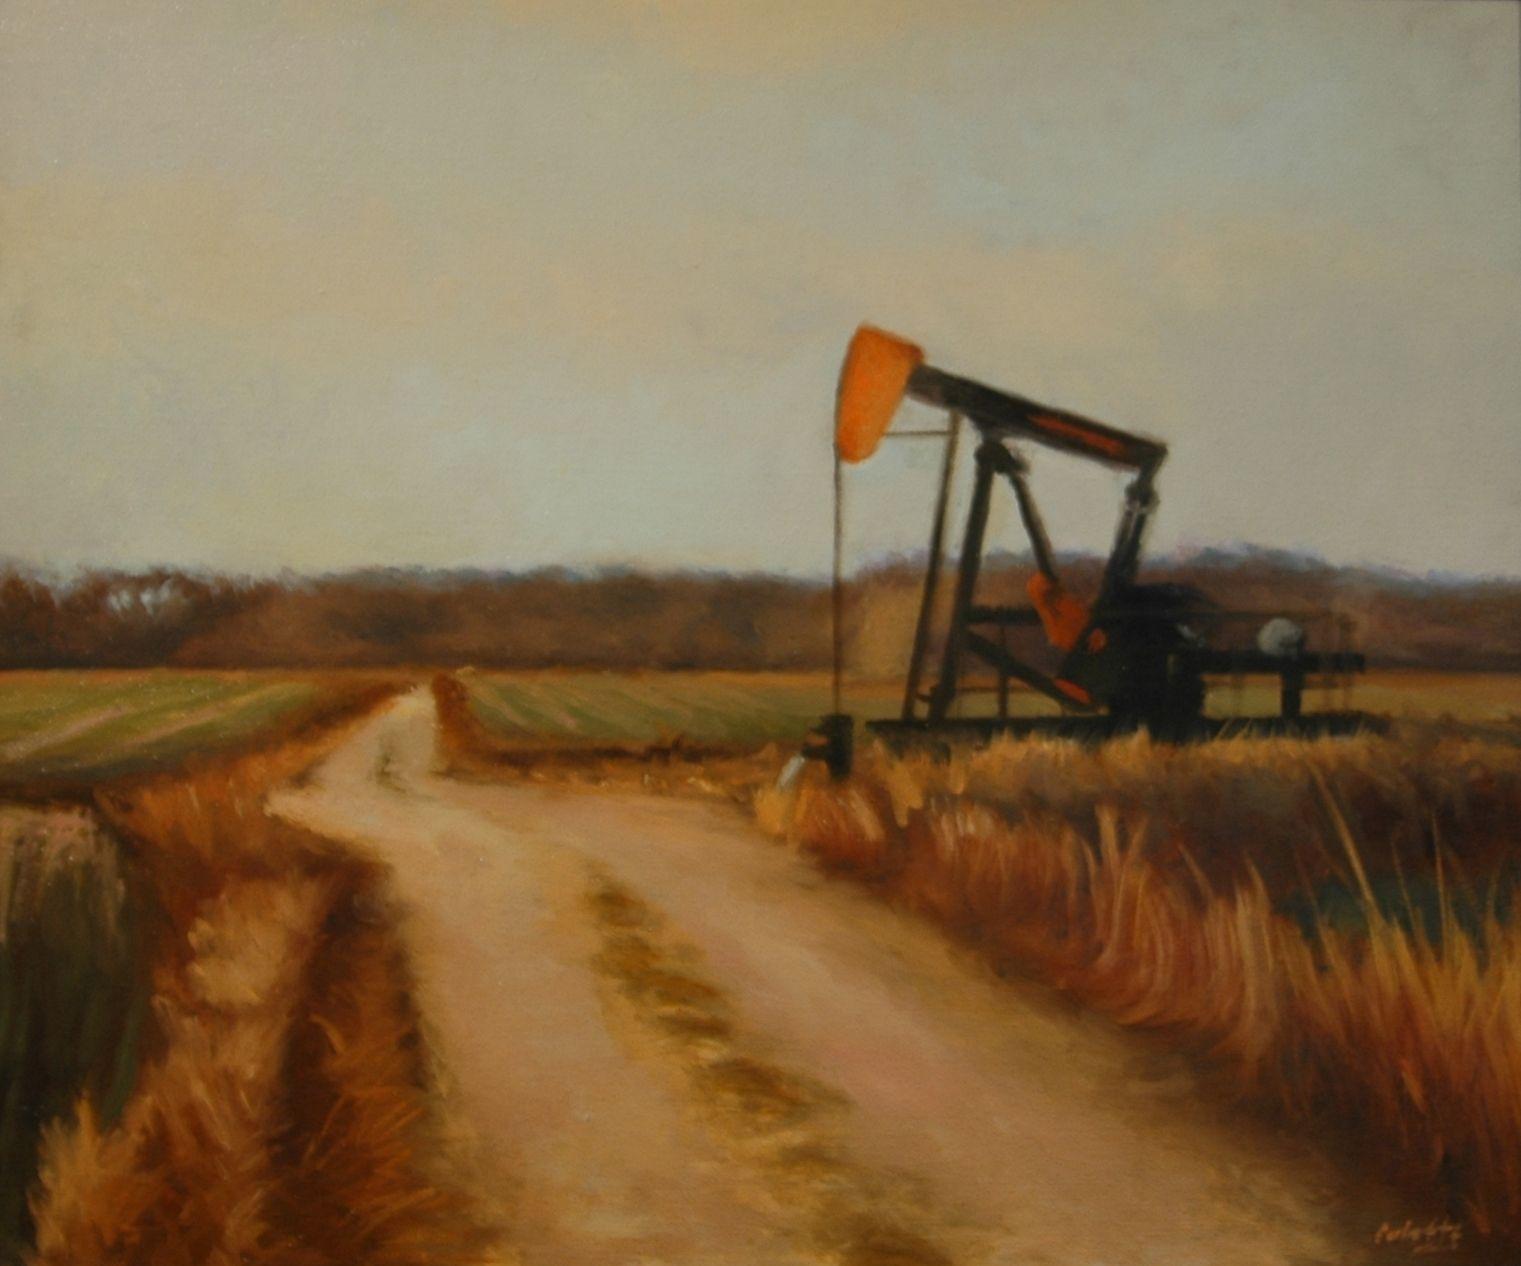 "Kansas oil well 20""x24"" oil on canvas Kansas, Oil well"